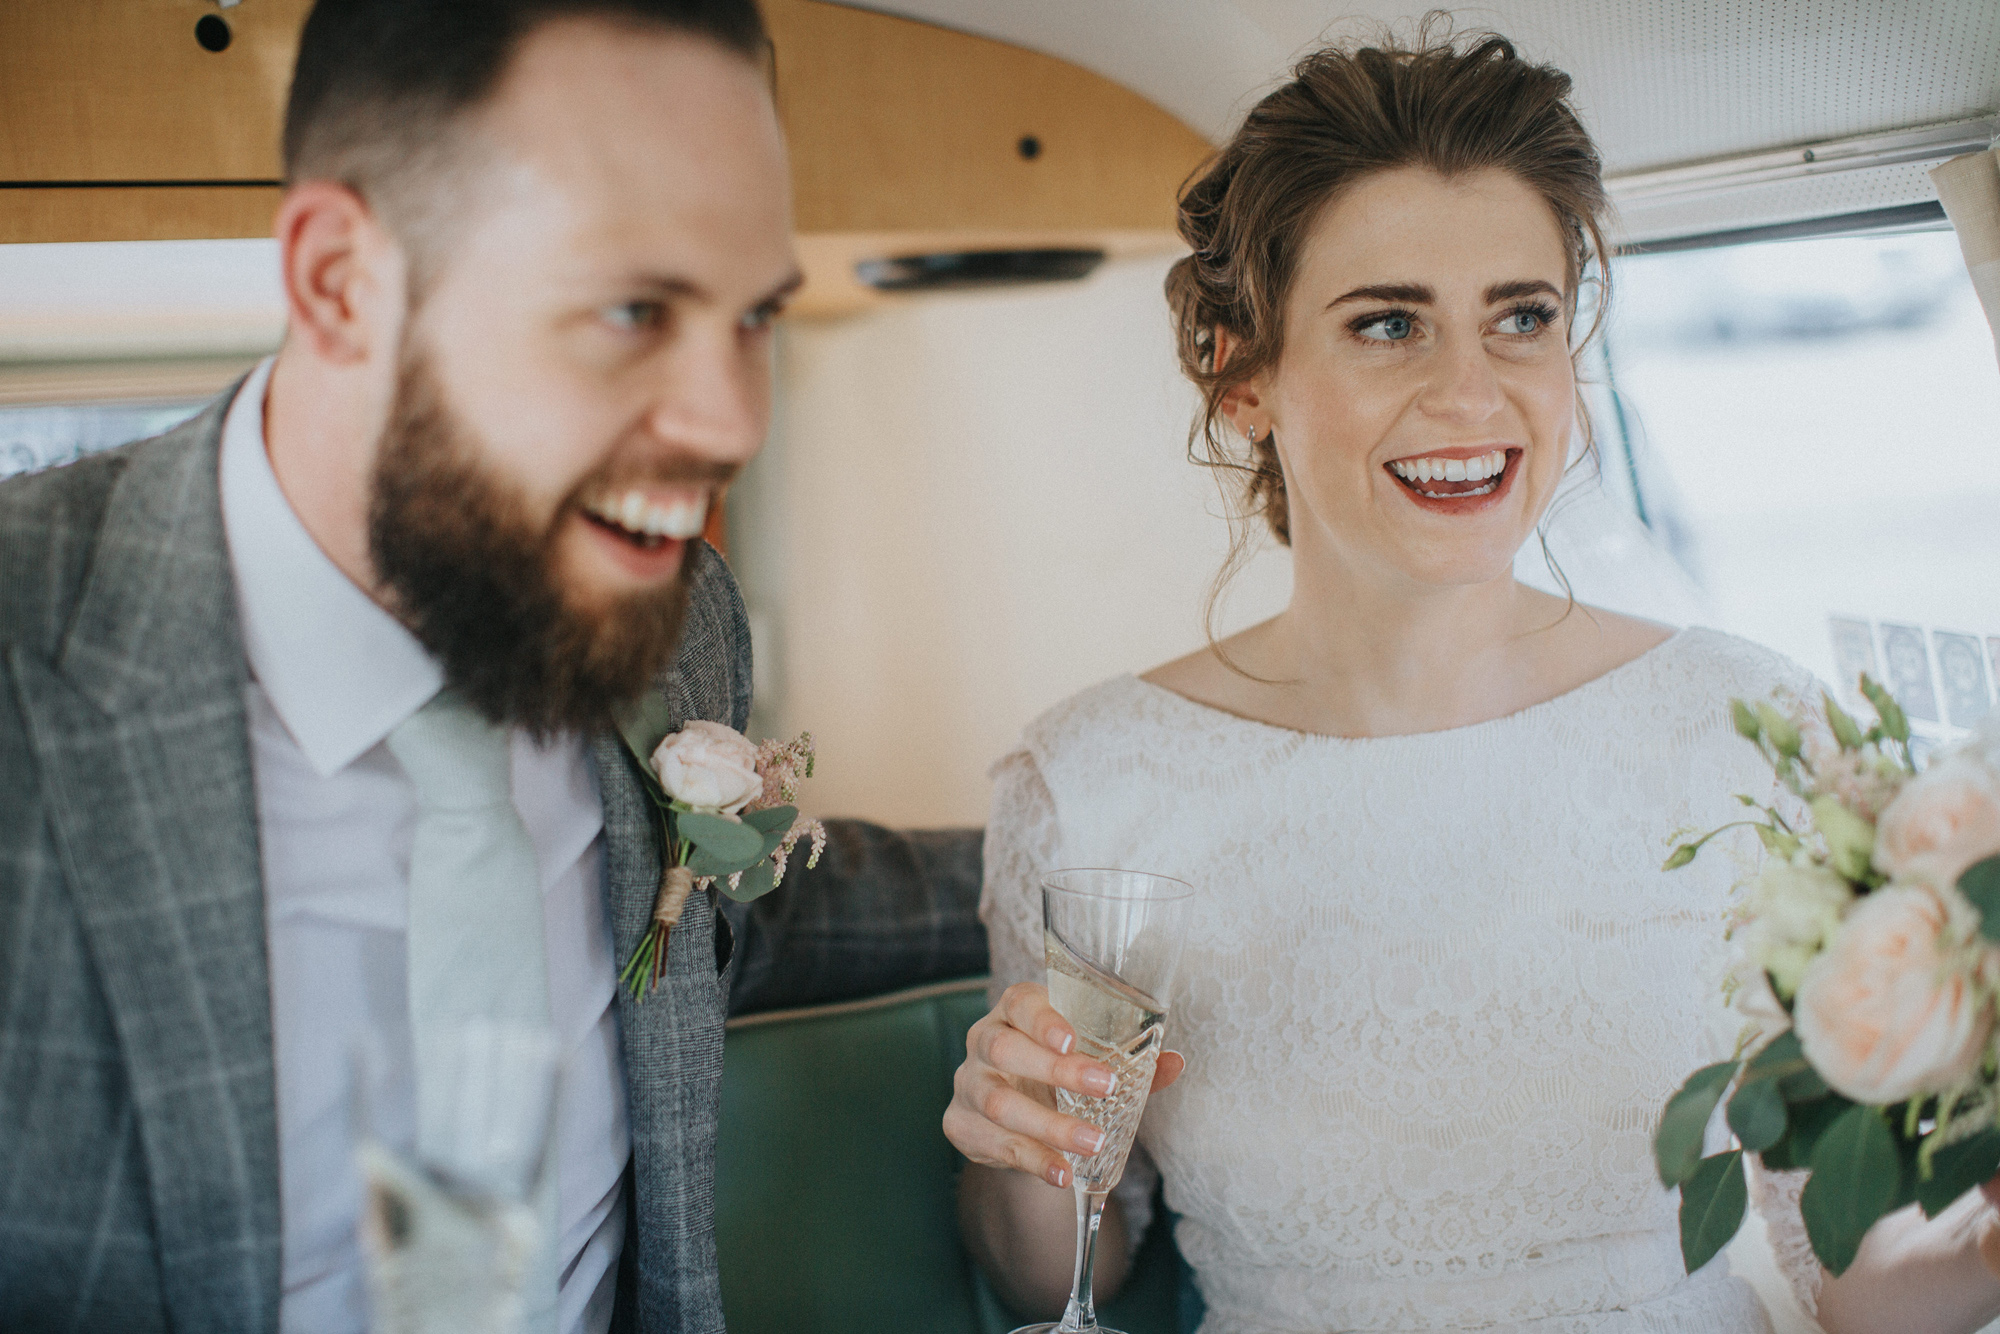 Kate-Beaumont-Lace-Flared-Dahlia-Gown-Leeds-Wedding-Bloom-Weddings-31.jpg